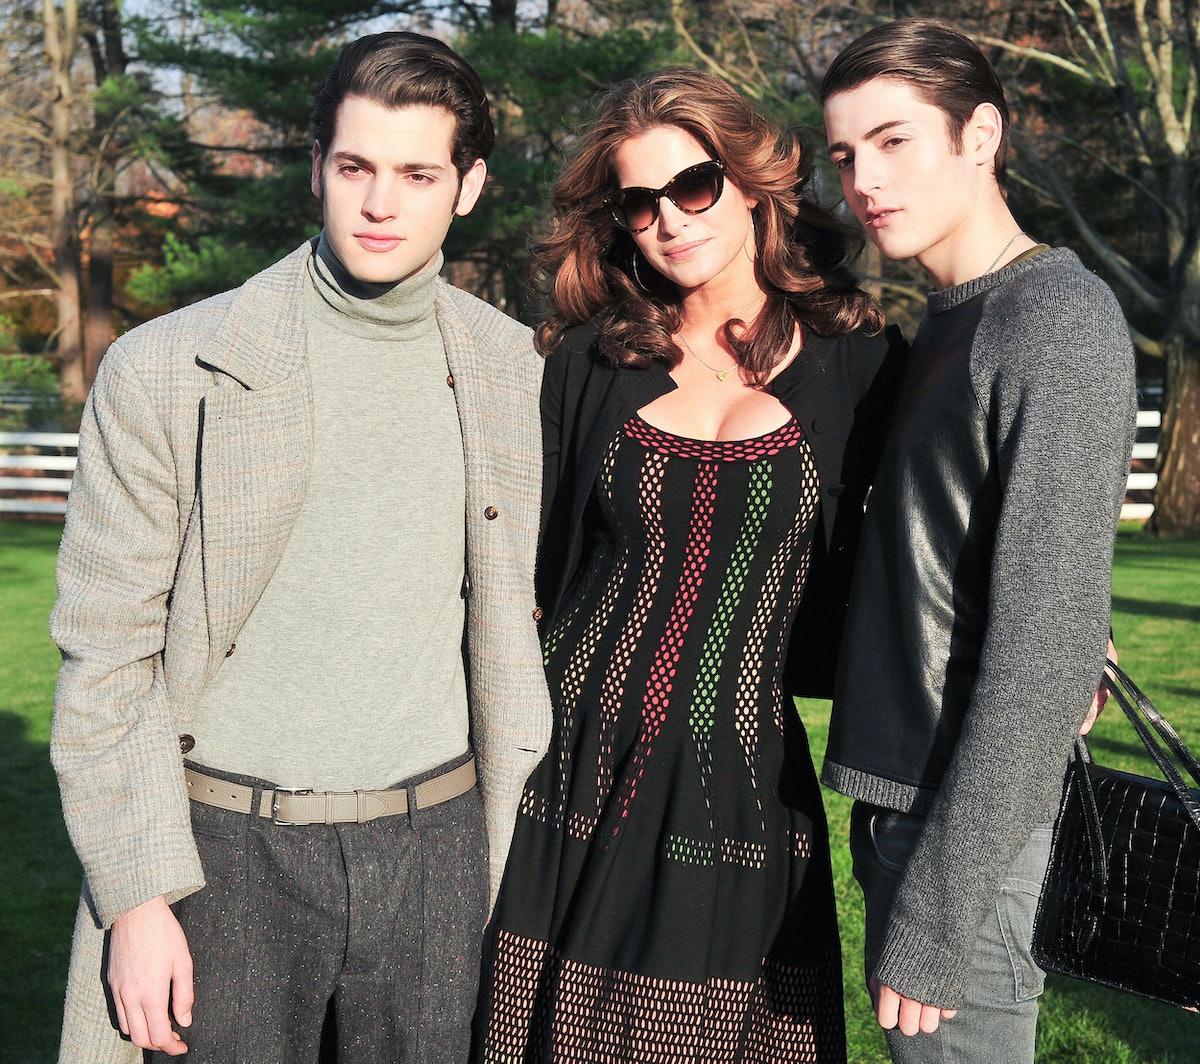 Peter Brant, Stephanie Seymour, and Harry Brant.